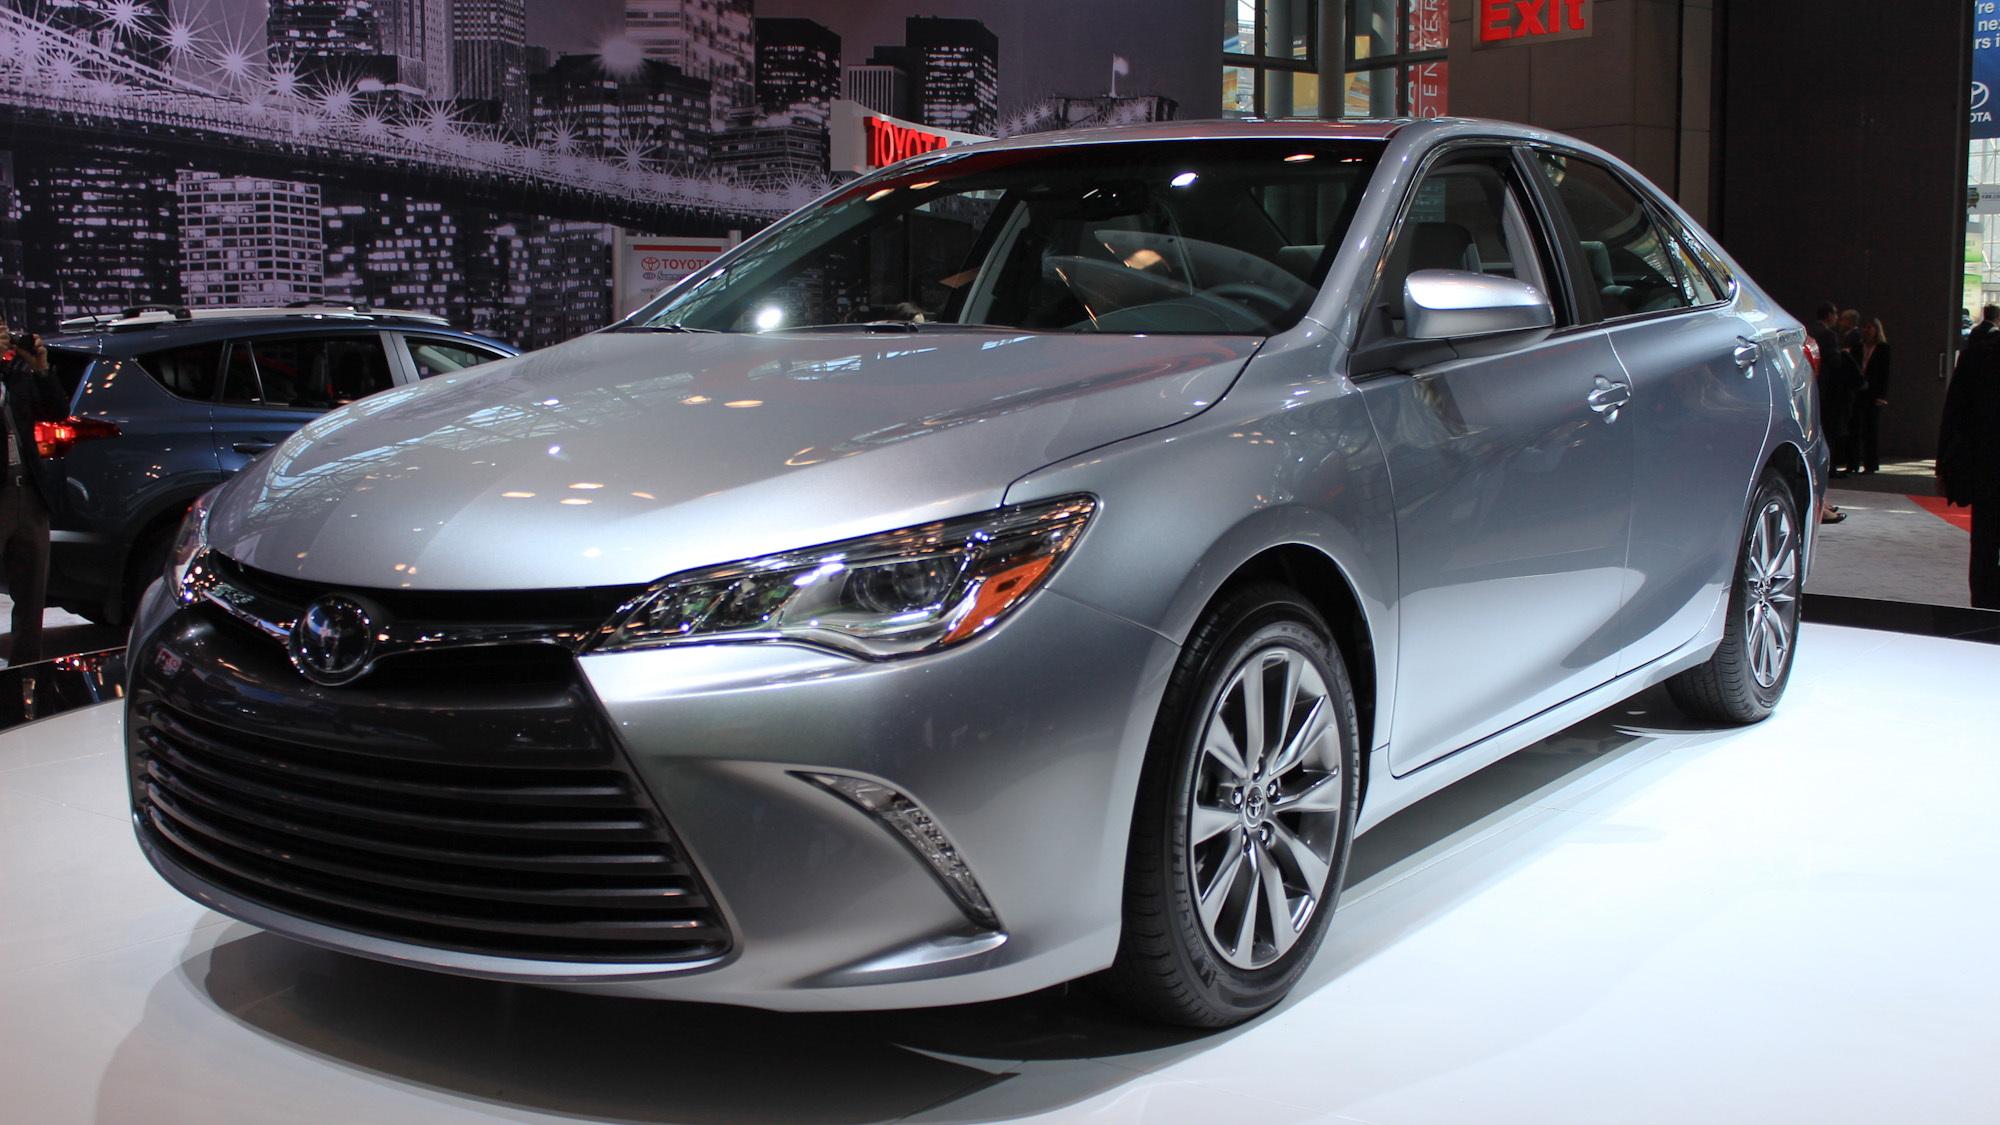 2015 Toyota Camry, 2014 New York Auto Show